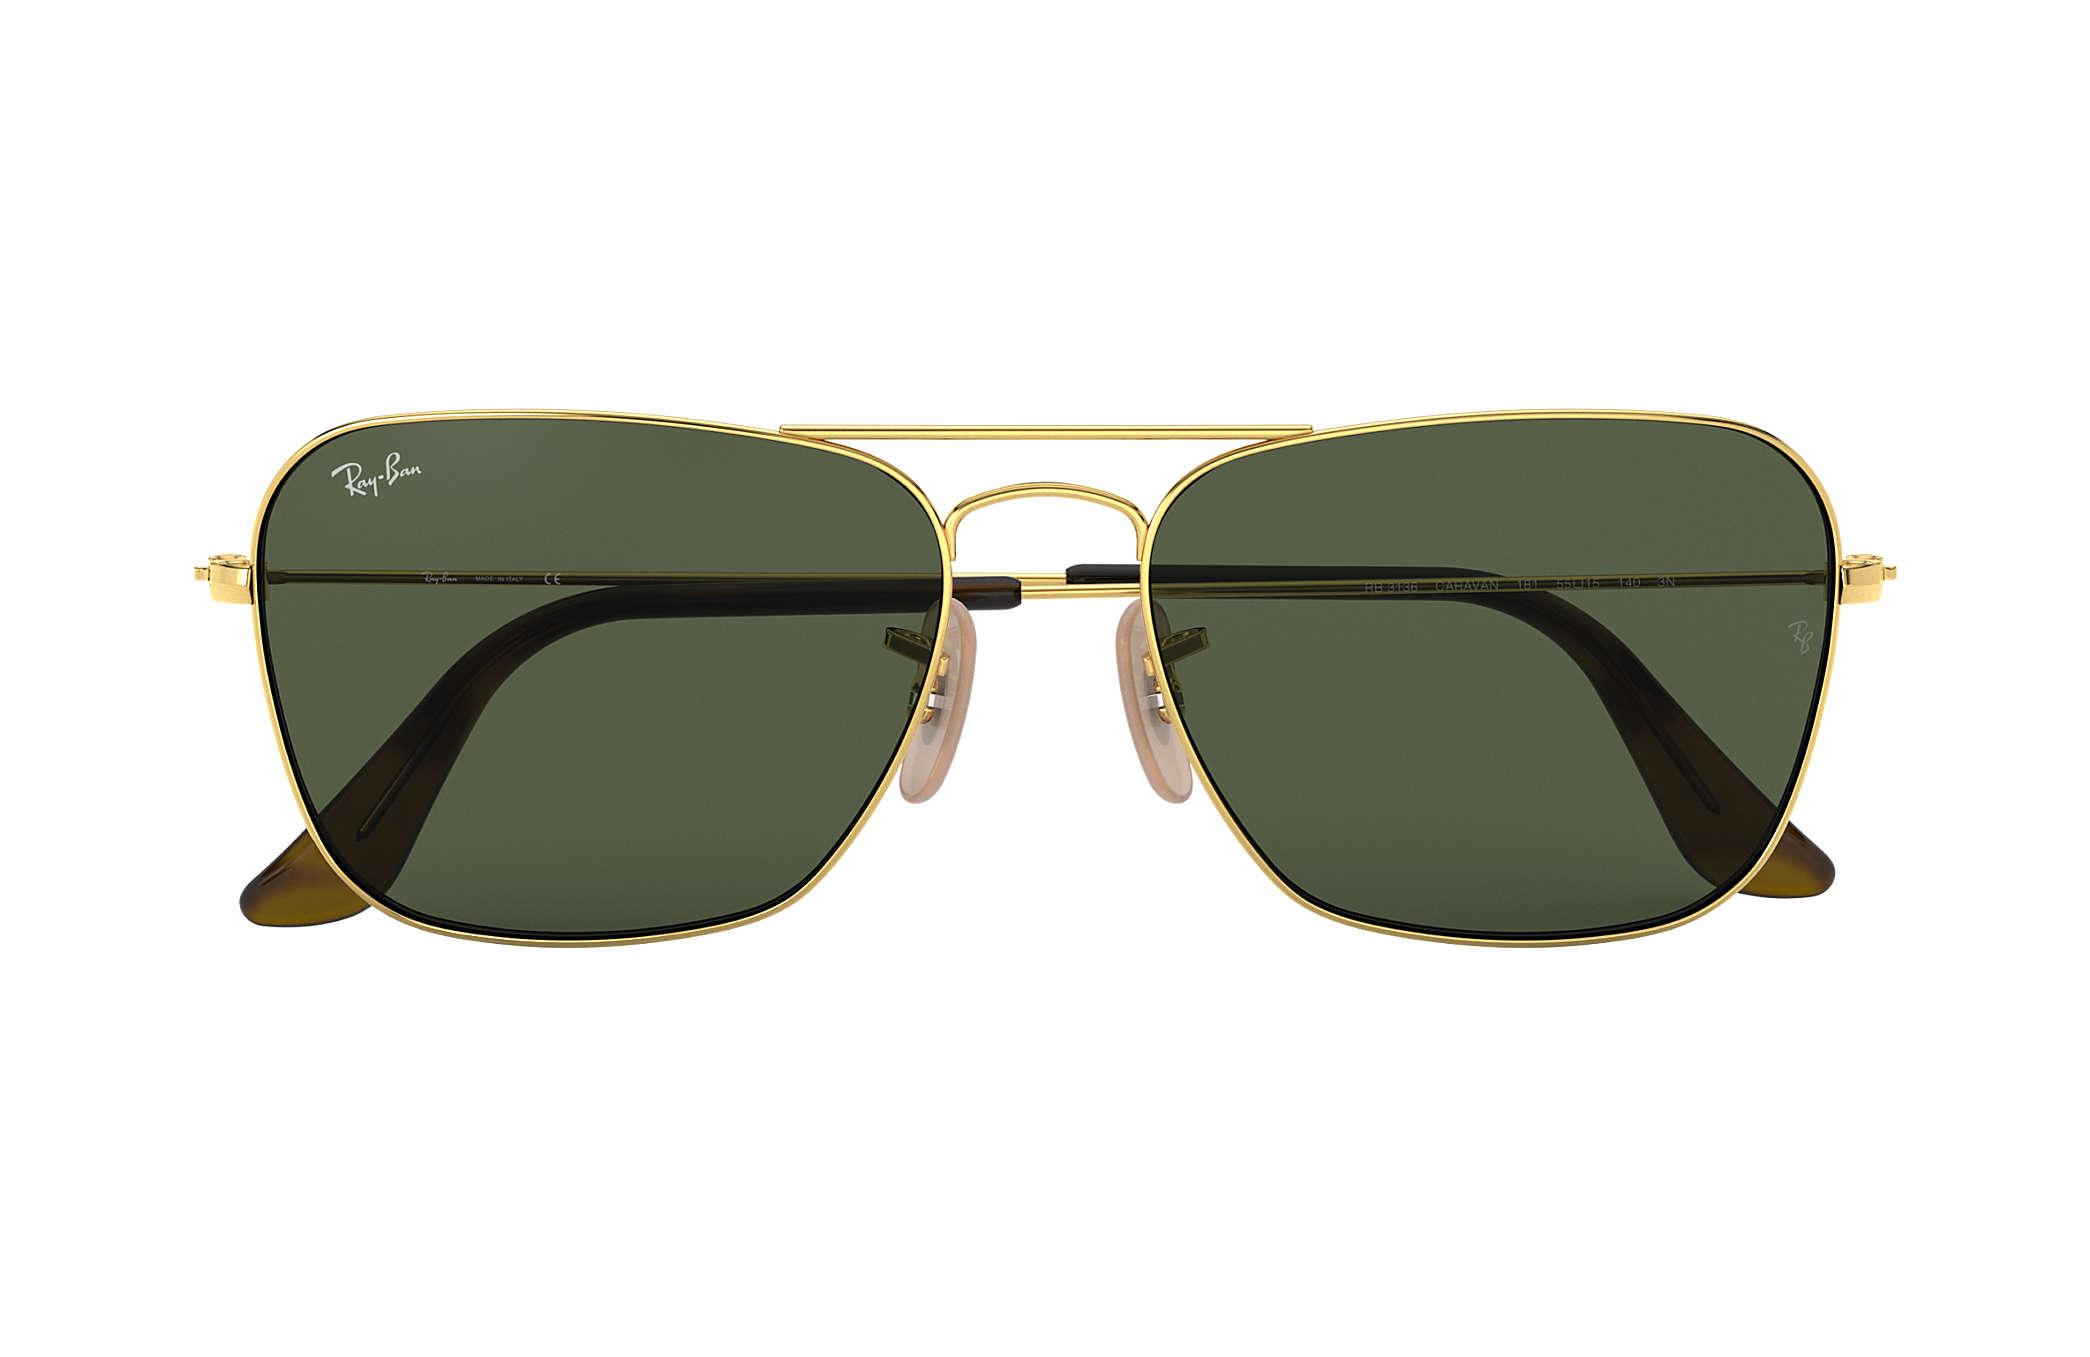 55-15 Green Classic G-15 Polarized NEW Aviator Caravan Outdoorsman Sunglasses